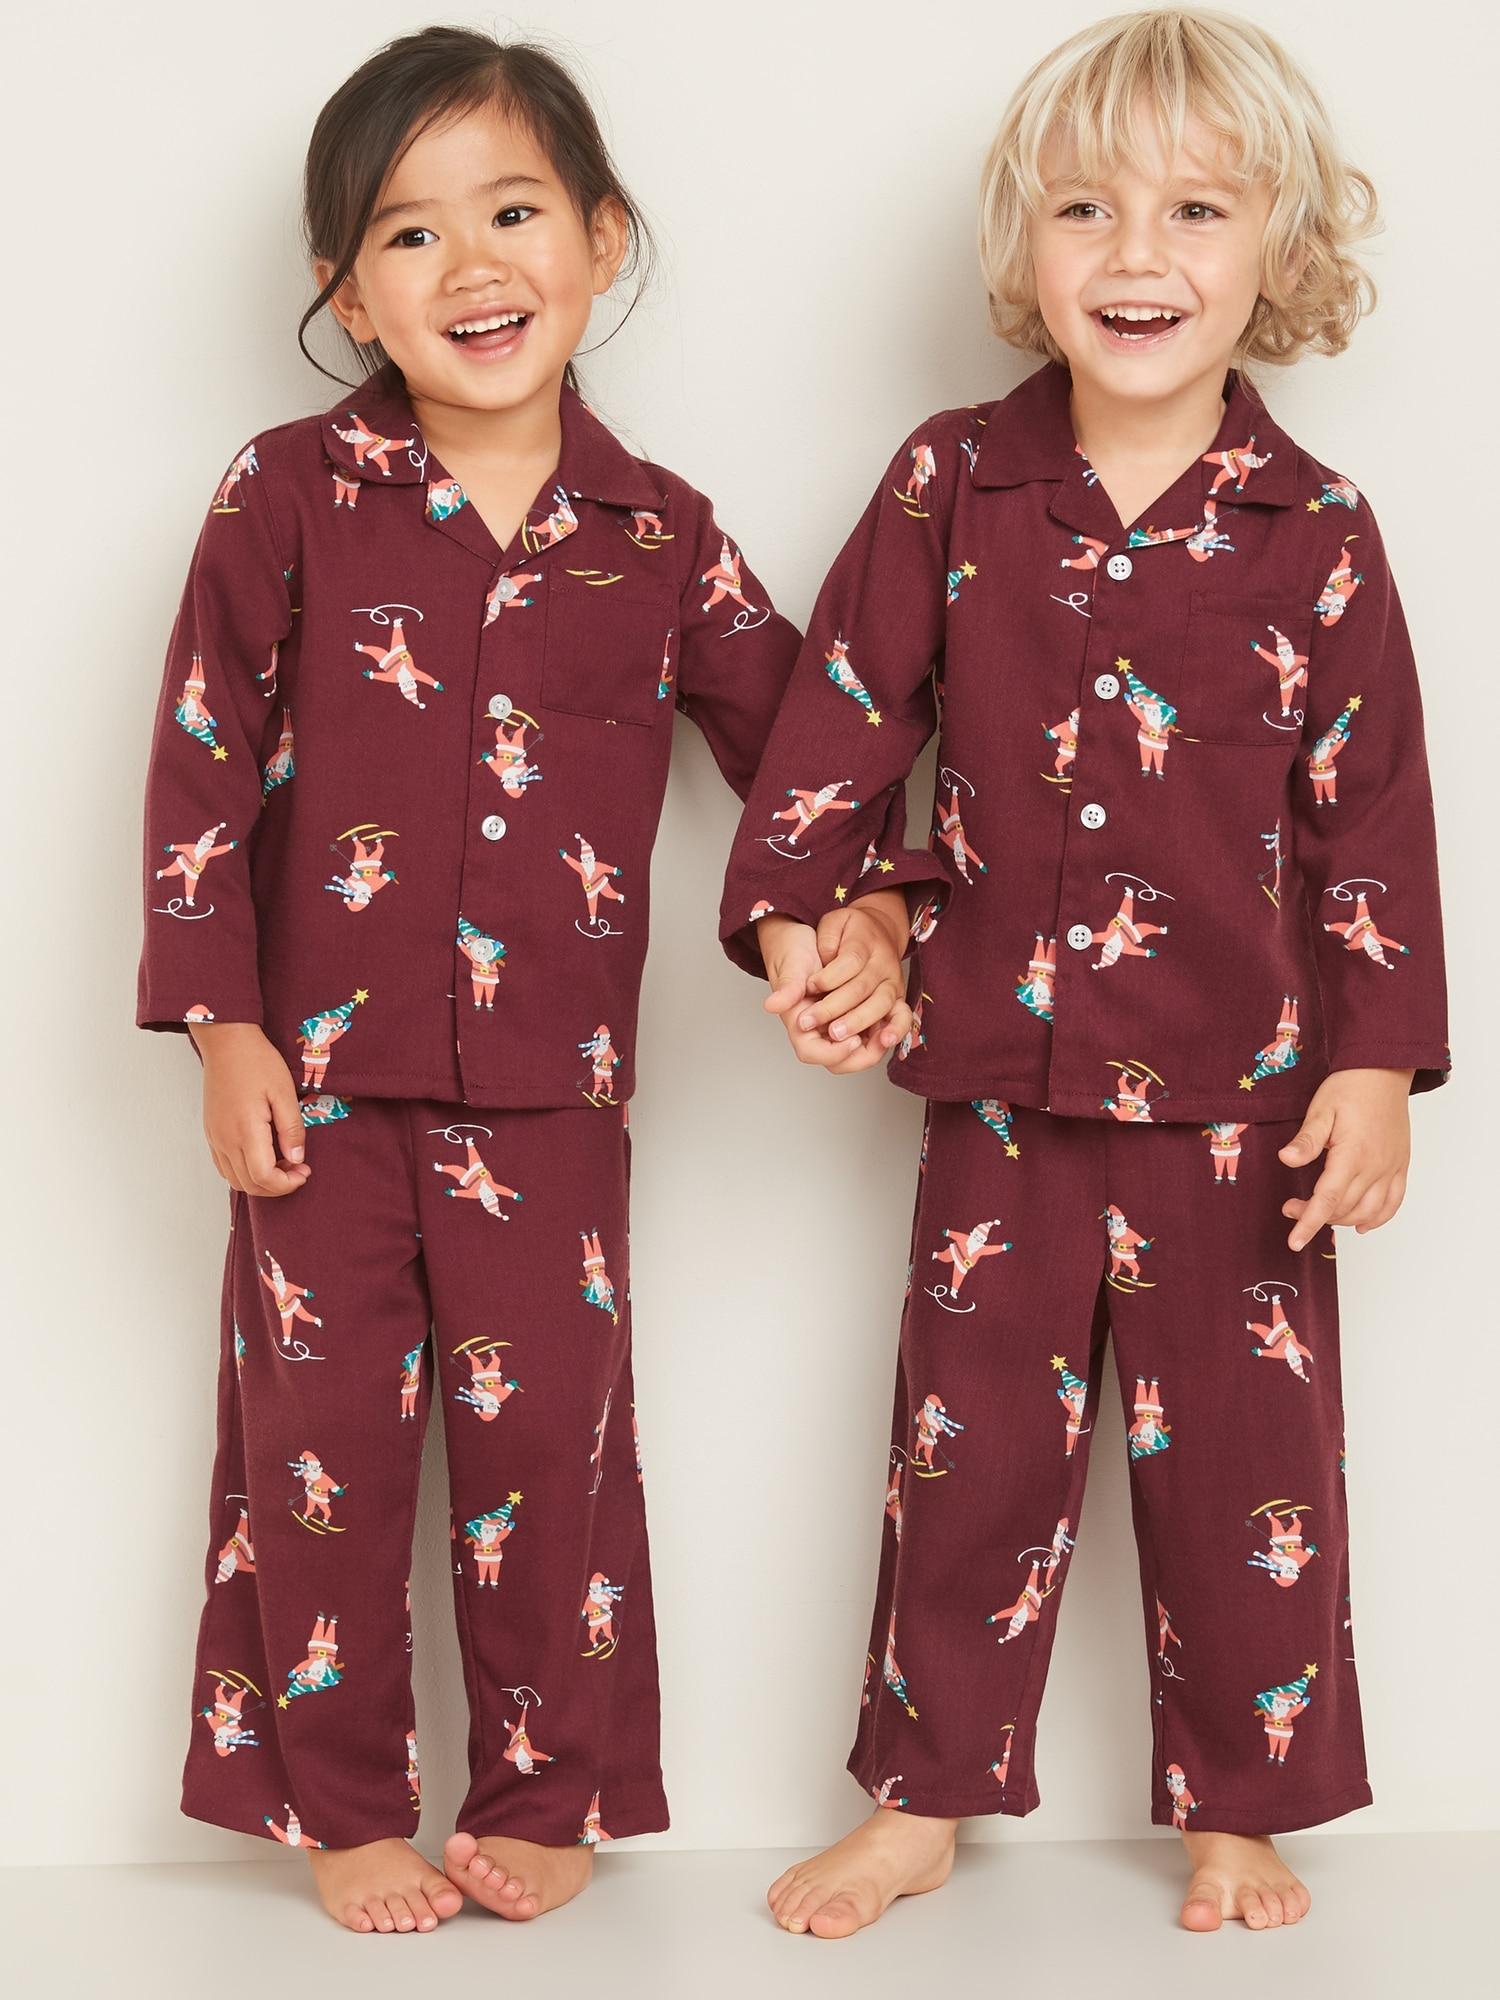 Baby Gap Toddler 3 Years Girls Red Winter Heart Snowman Cotton Pajama Set